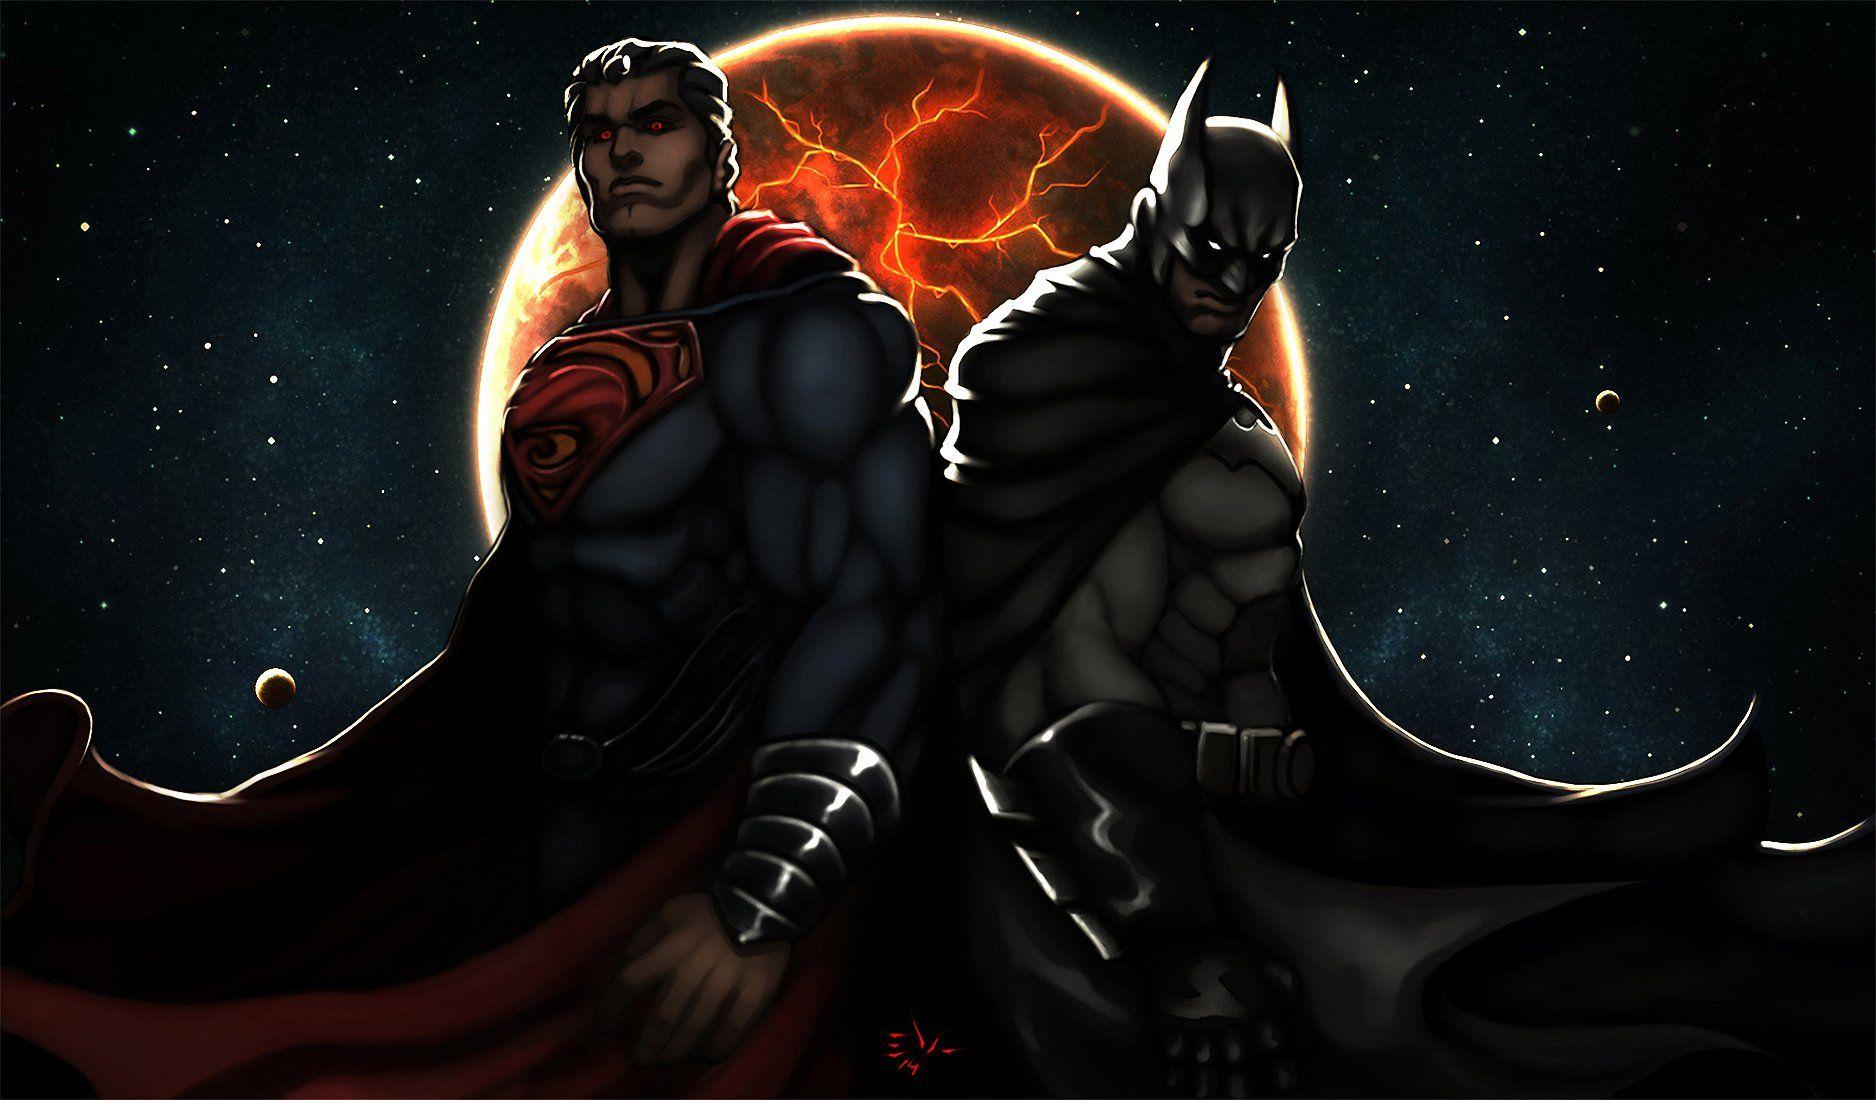 селезнёва бэтмен против супермена картинки бэтмена первого чемпионата